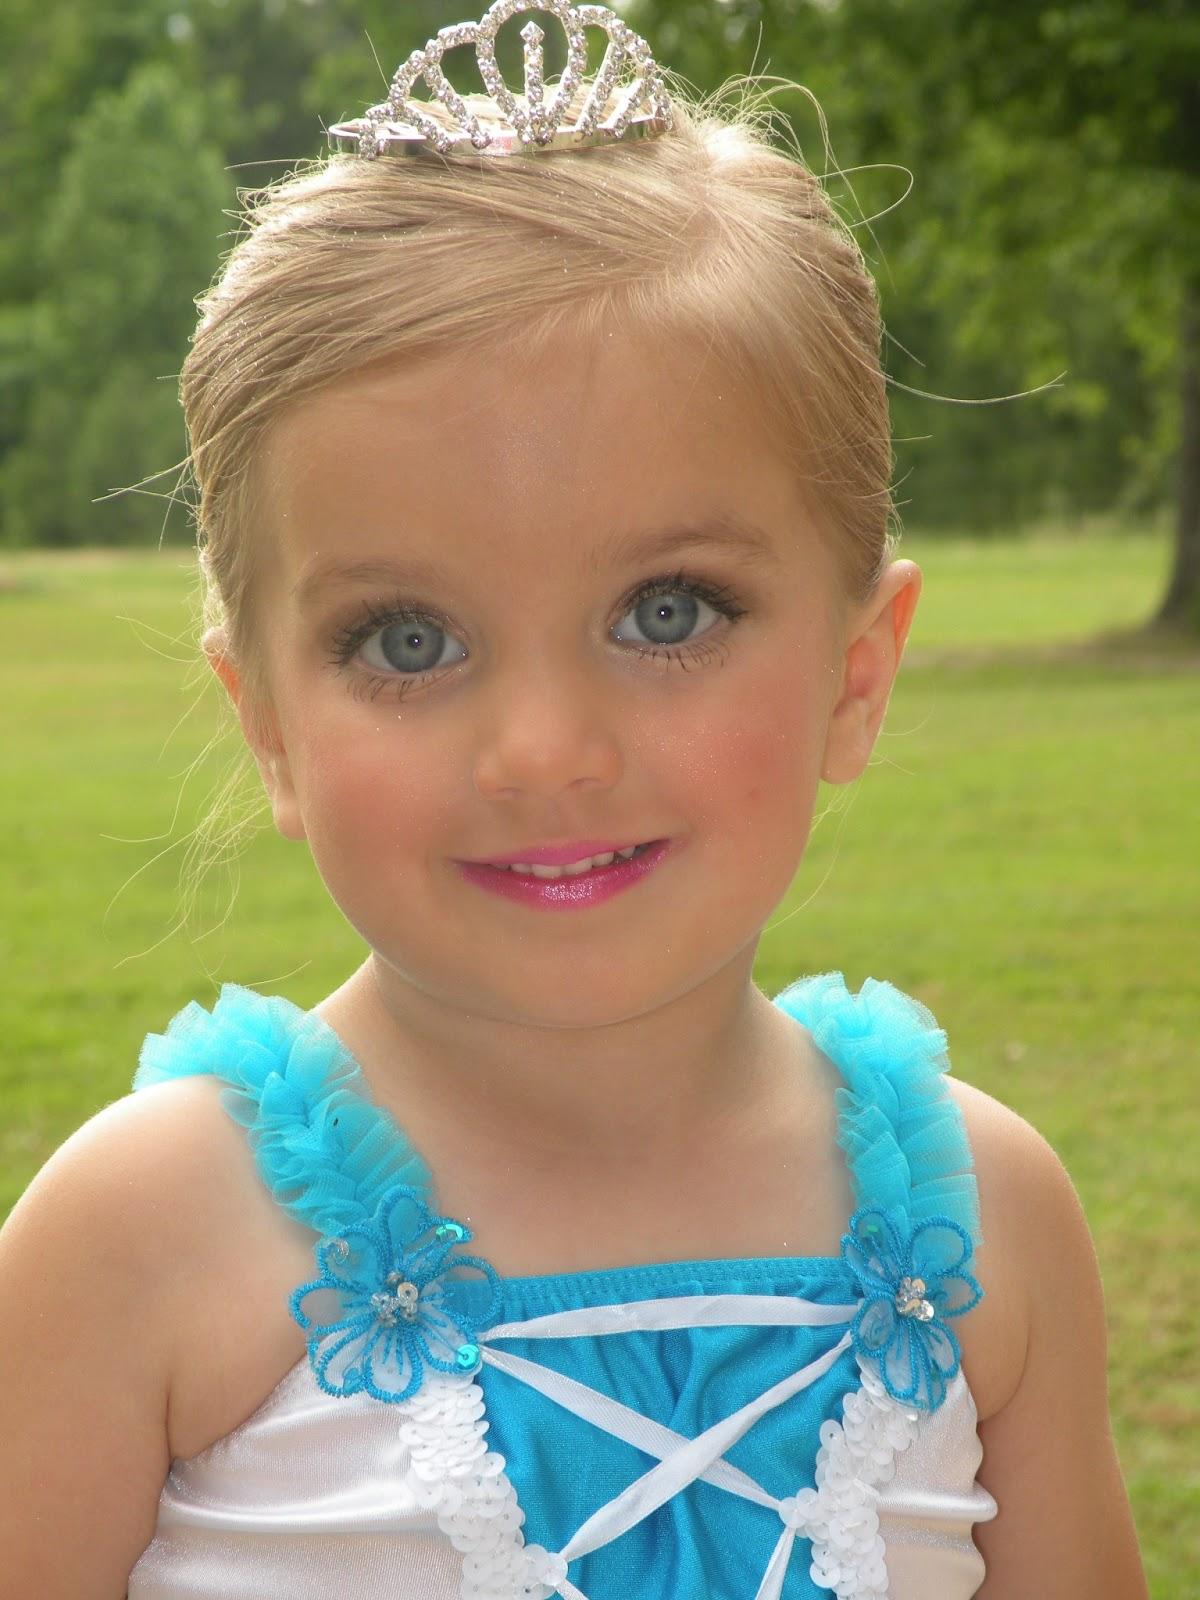 childrens makeup for dance recital